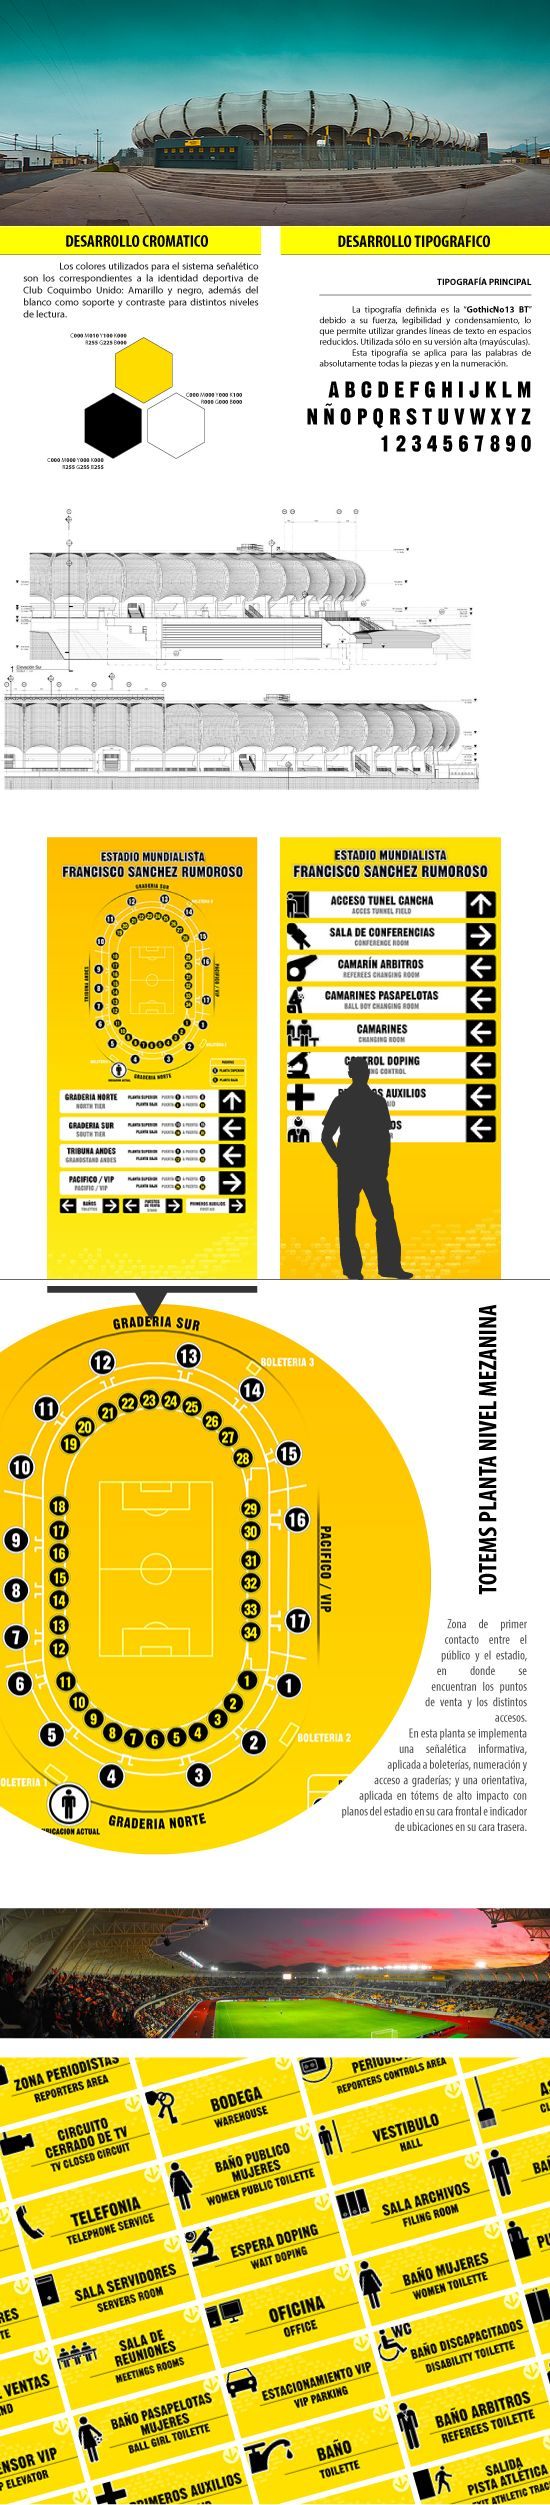 2009 / Signage Stadium Francisco Sanchez Rumoroso on Behance #graphic #design